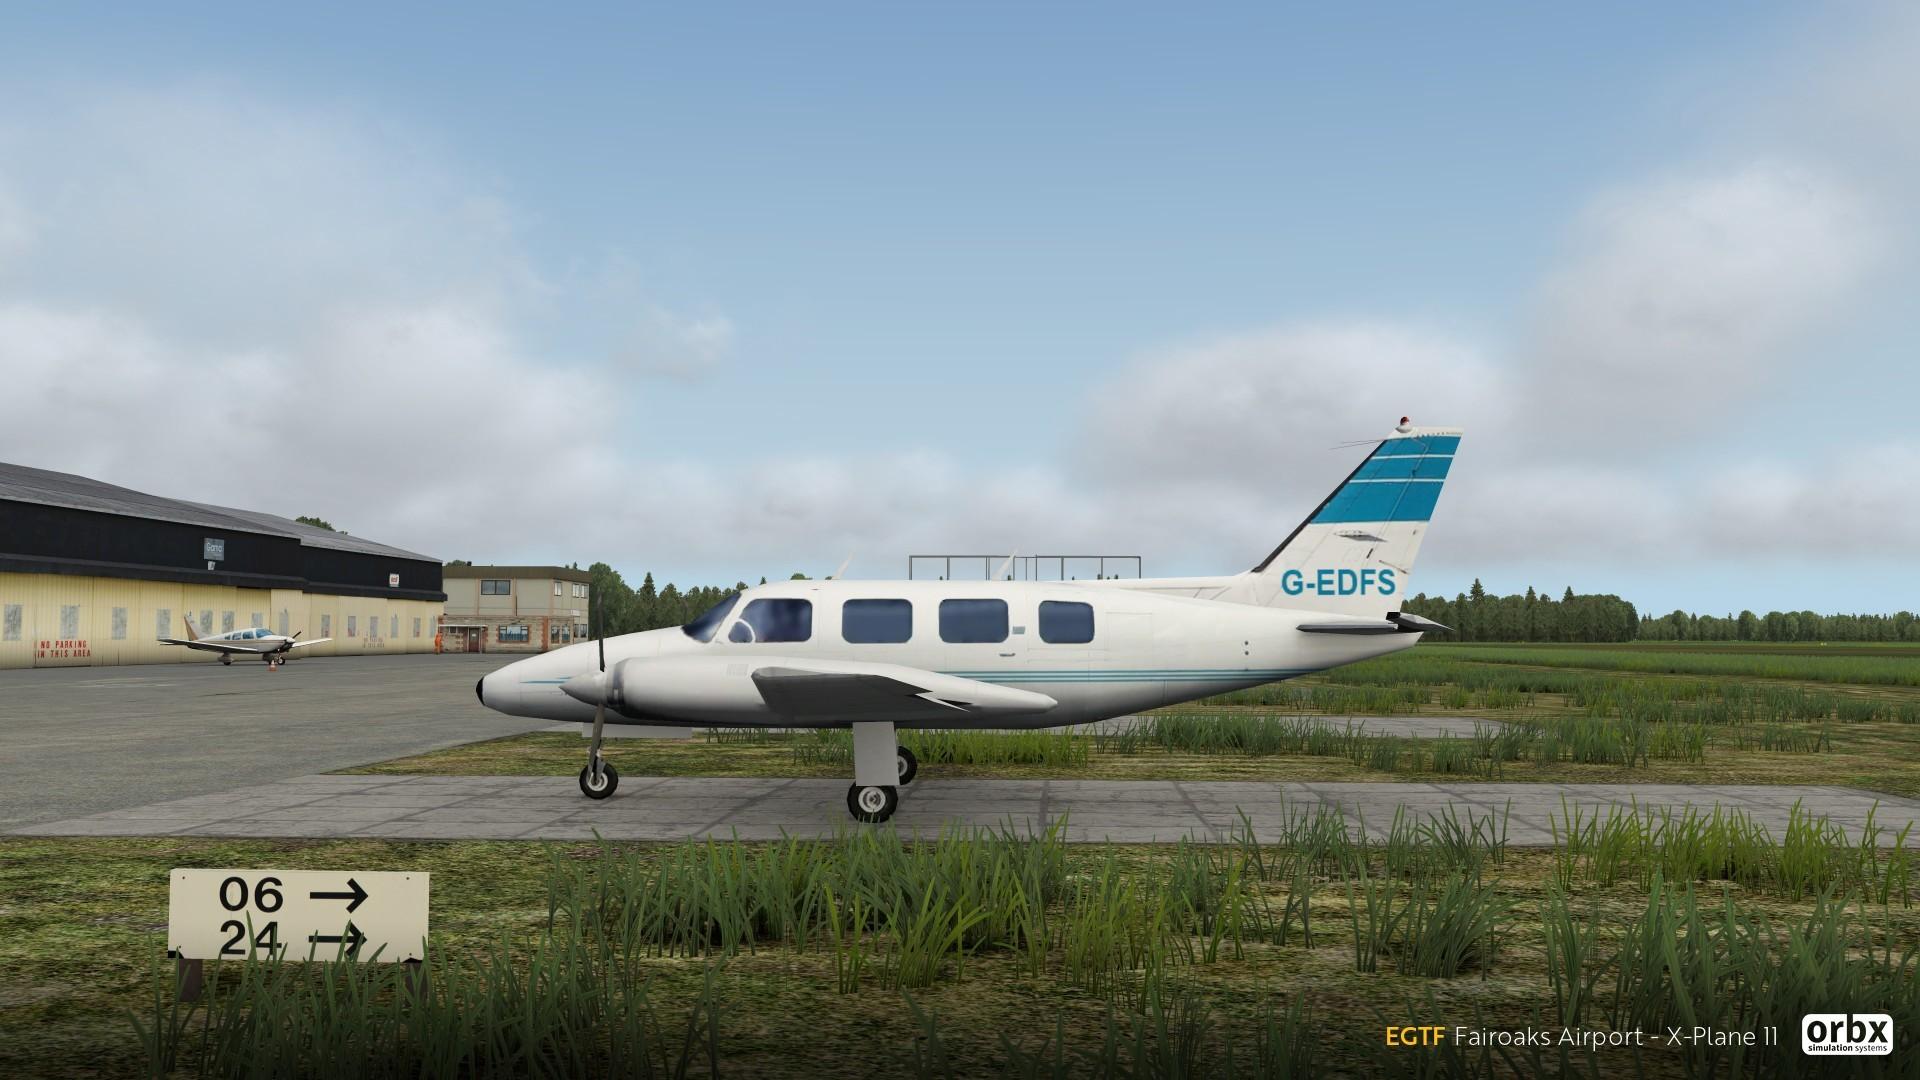 EGTF Fairoaks Airport - X-Plane 11